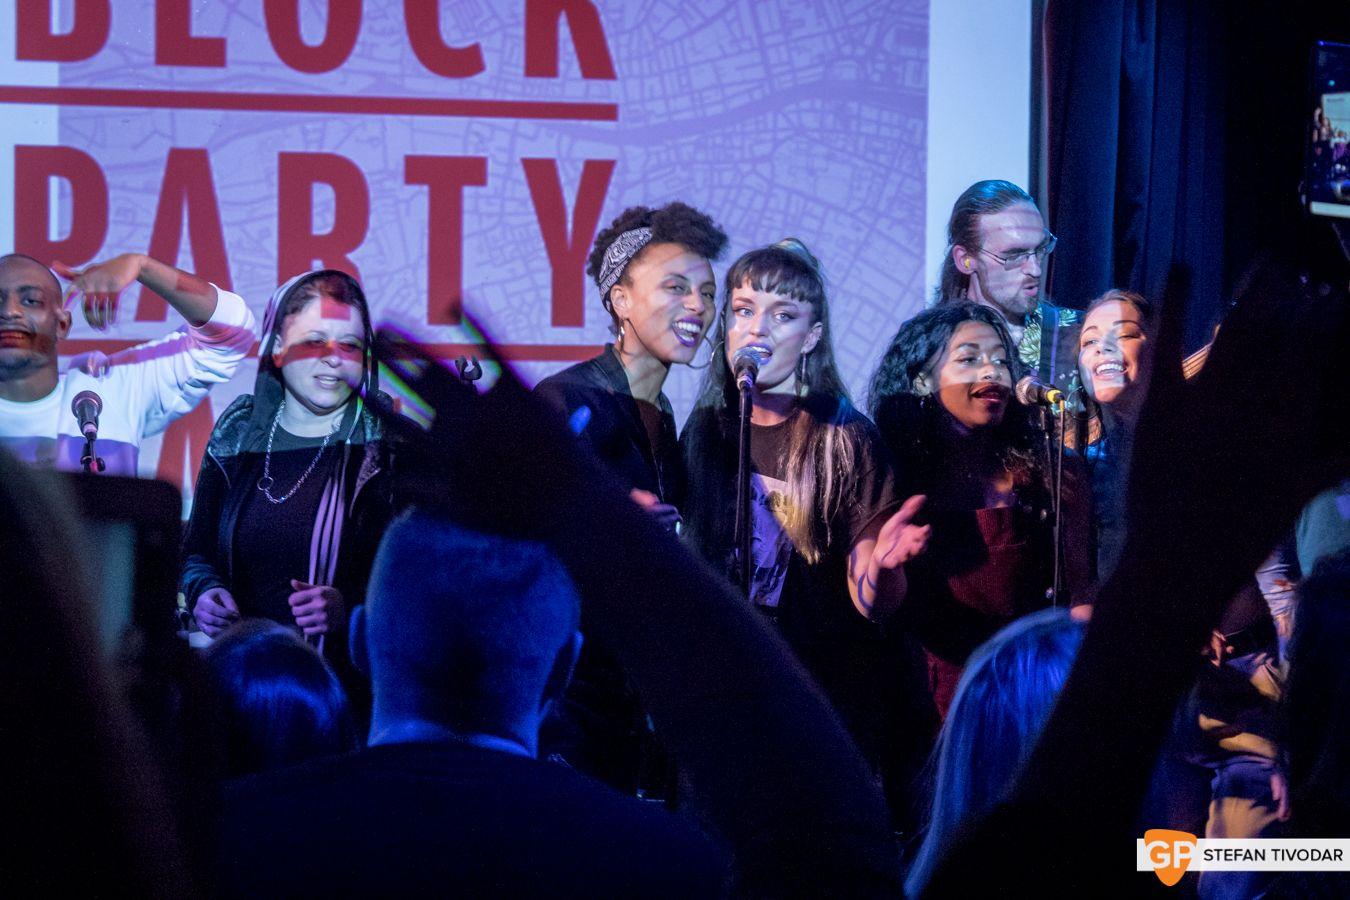 Everybody GoldenPlec Bloc Party Jam 2018 Sugar Club 2